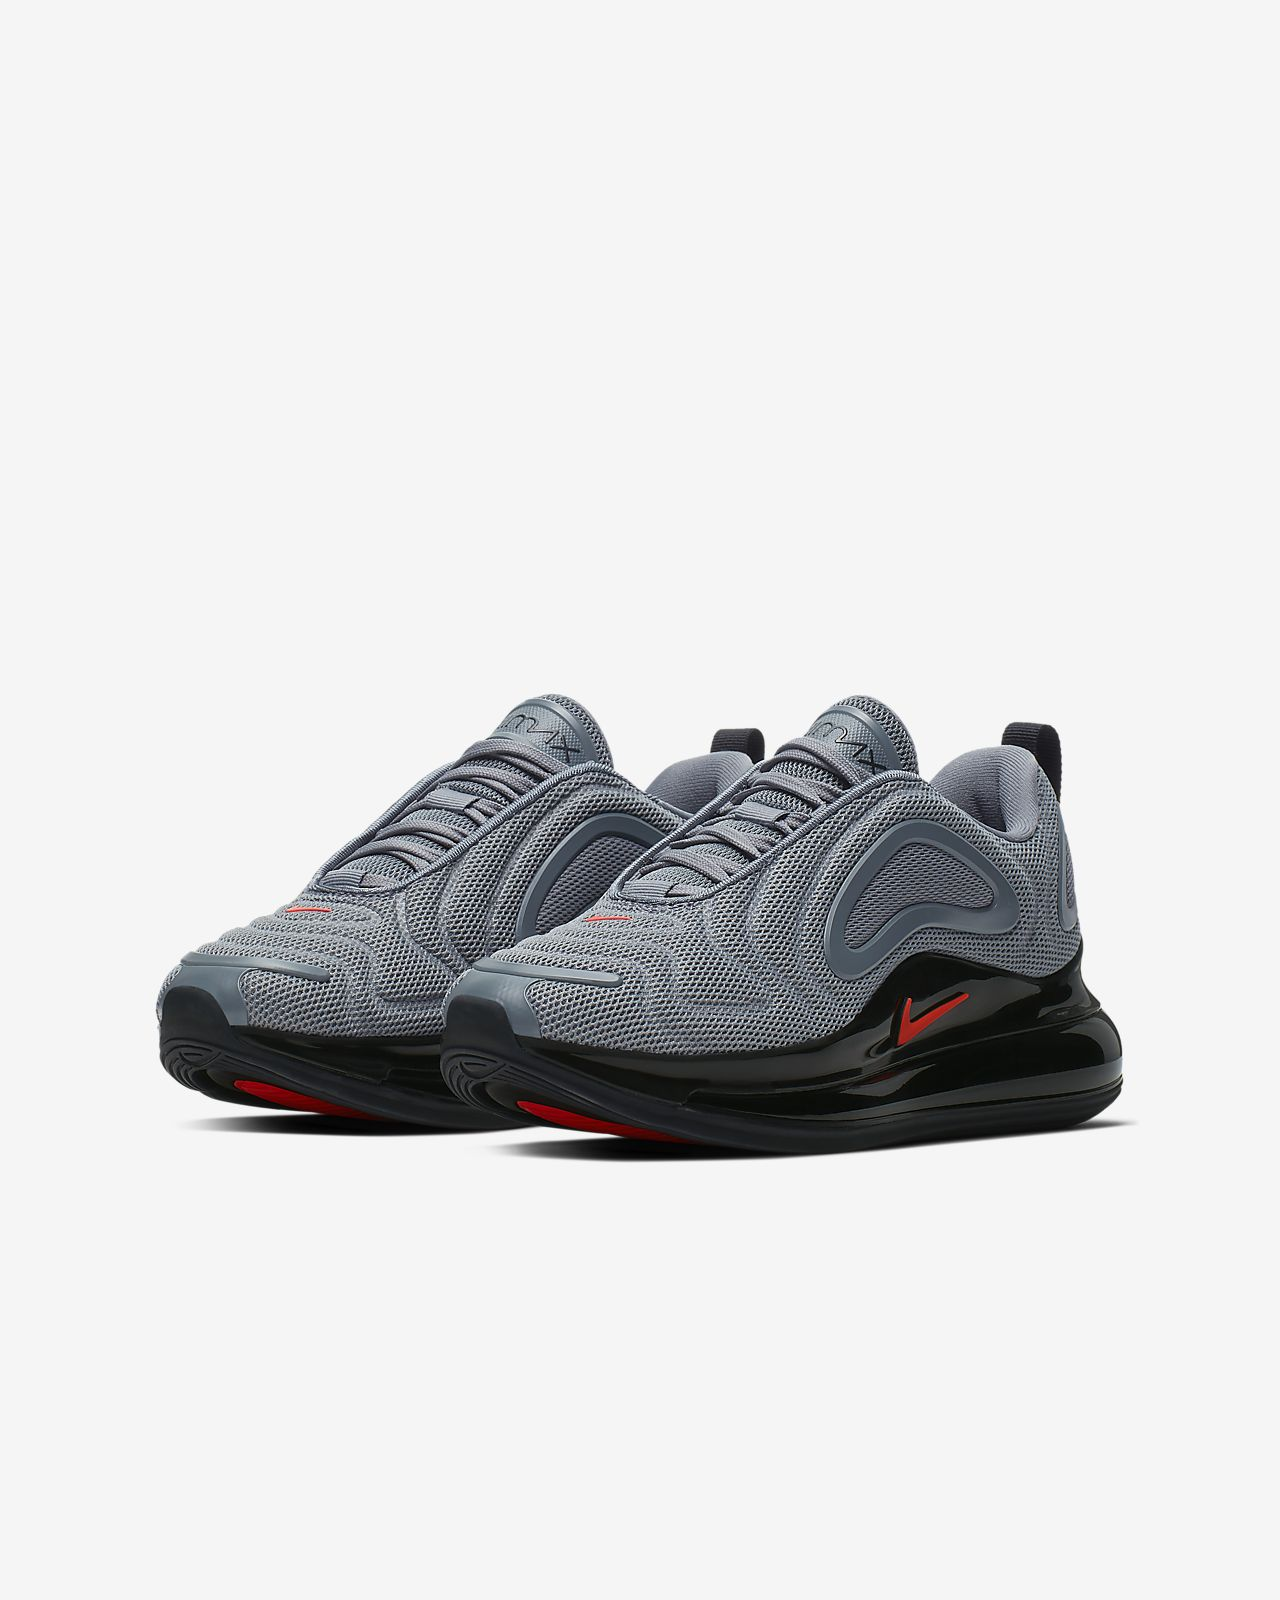 Sko Nike Air Max 720 för barnungdom